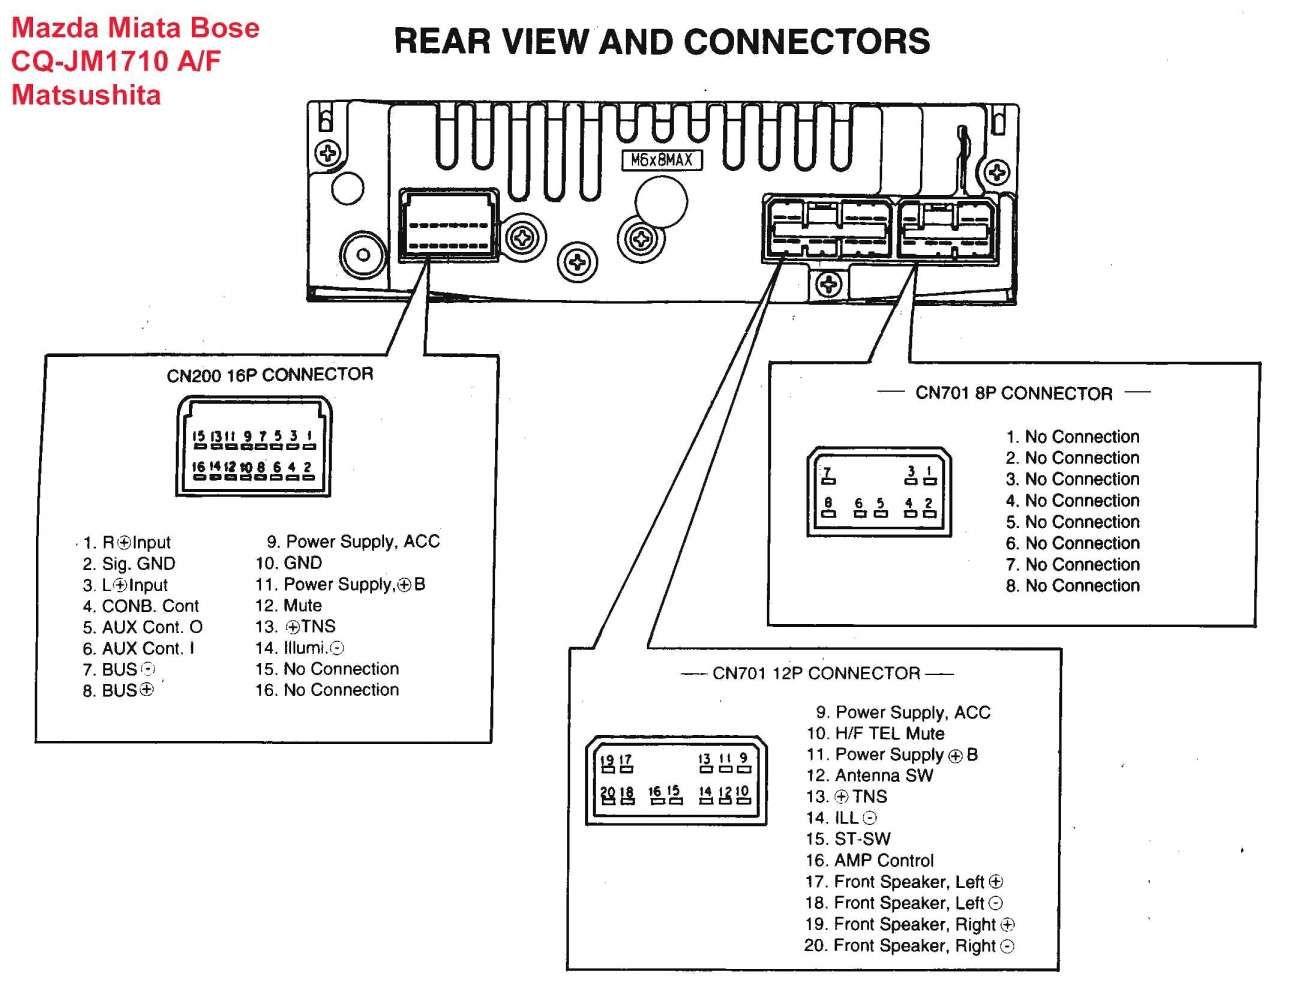 16 Pioneer Deh P3100ub Car Wiring Diagram Sony Car Stereo Car Stereo Systems Car Stereo